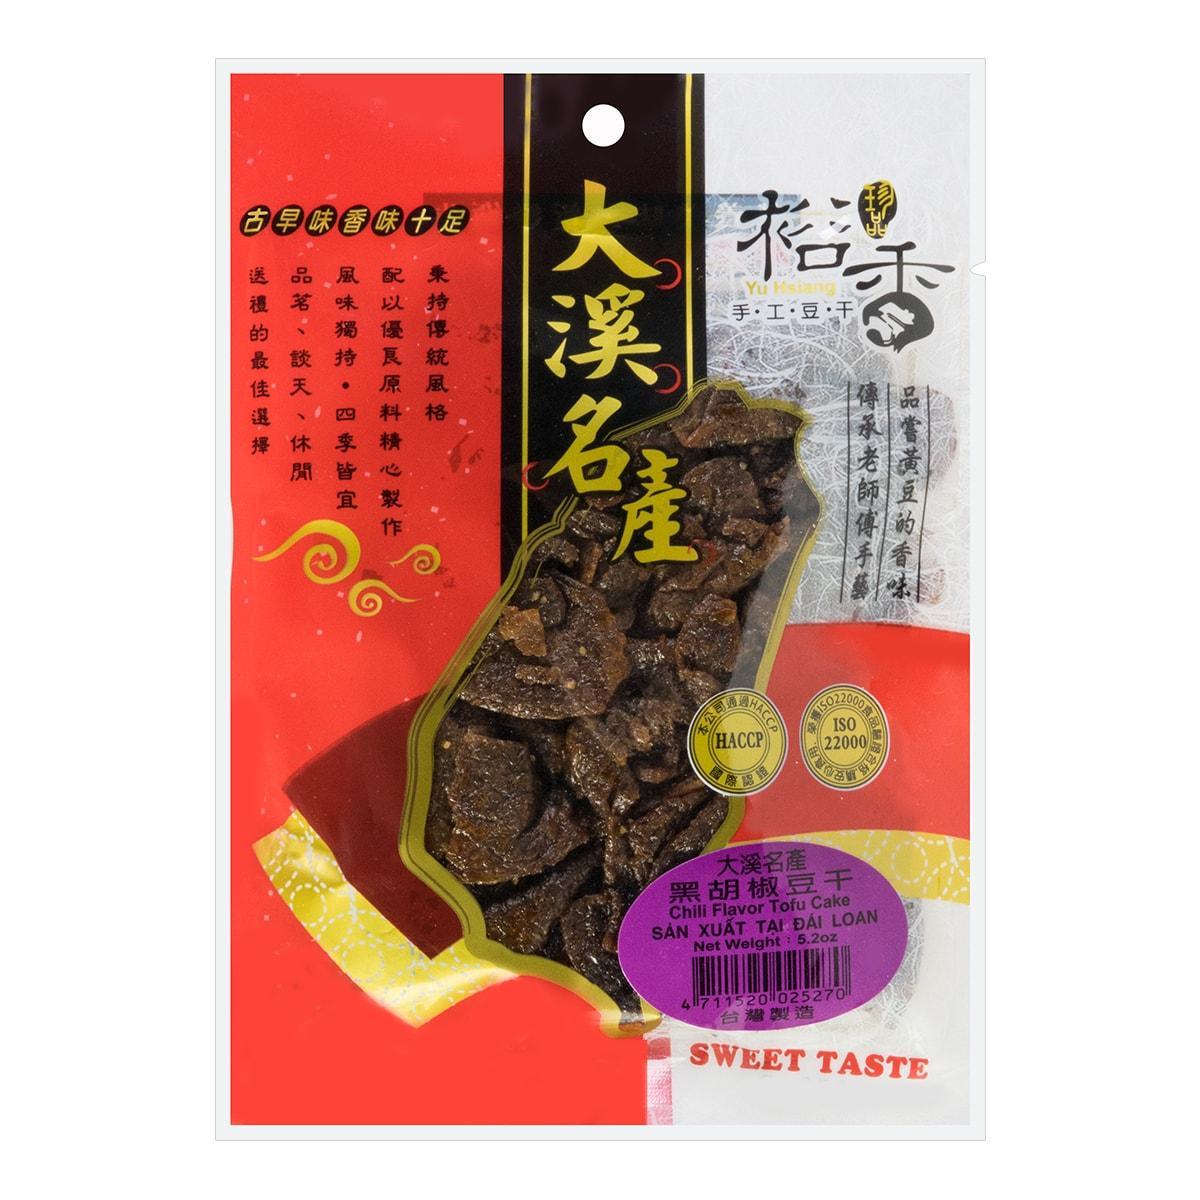 DAXI Chili Black Pepper Flavor Tofu Cake 150g